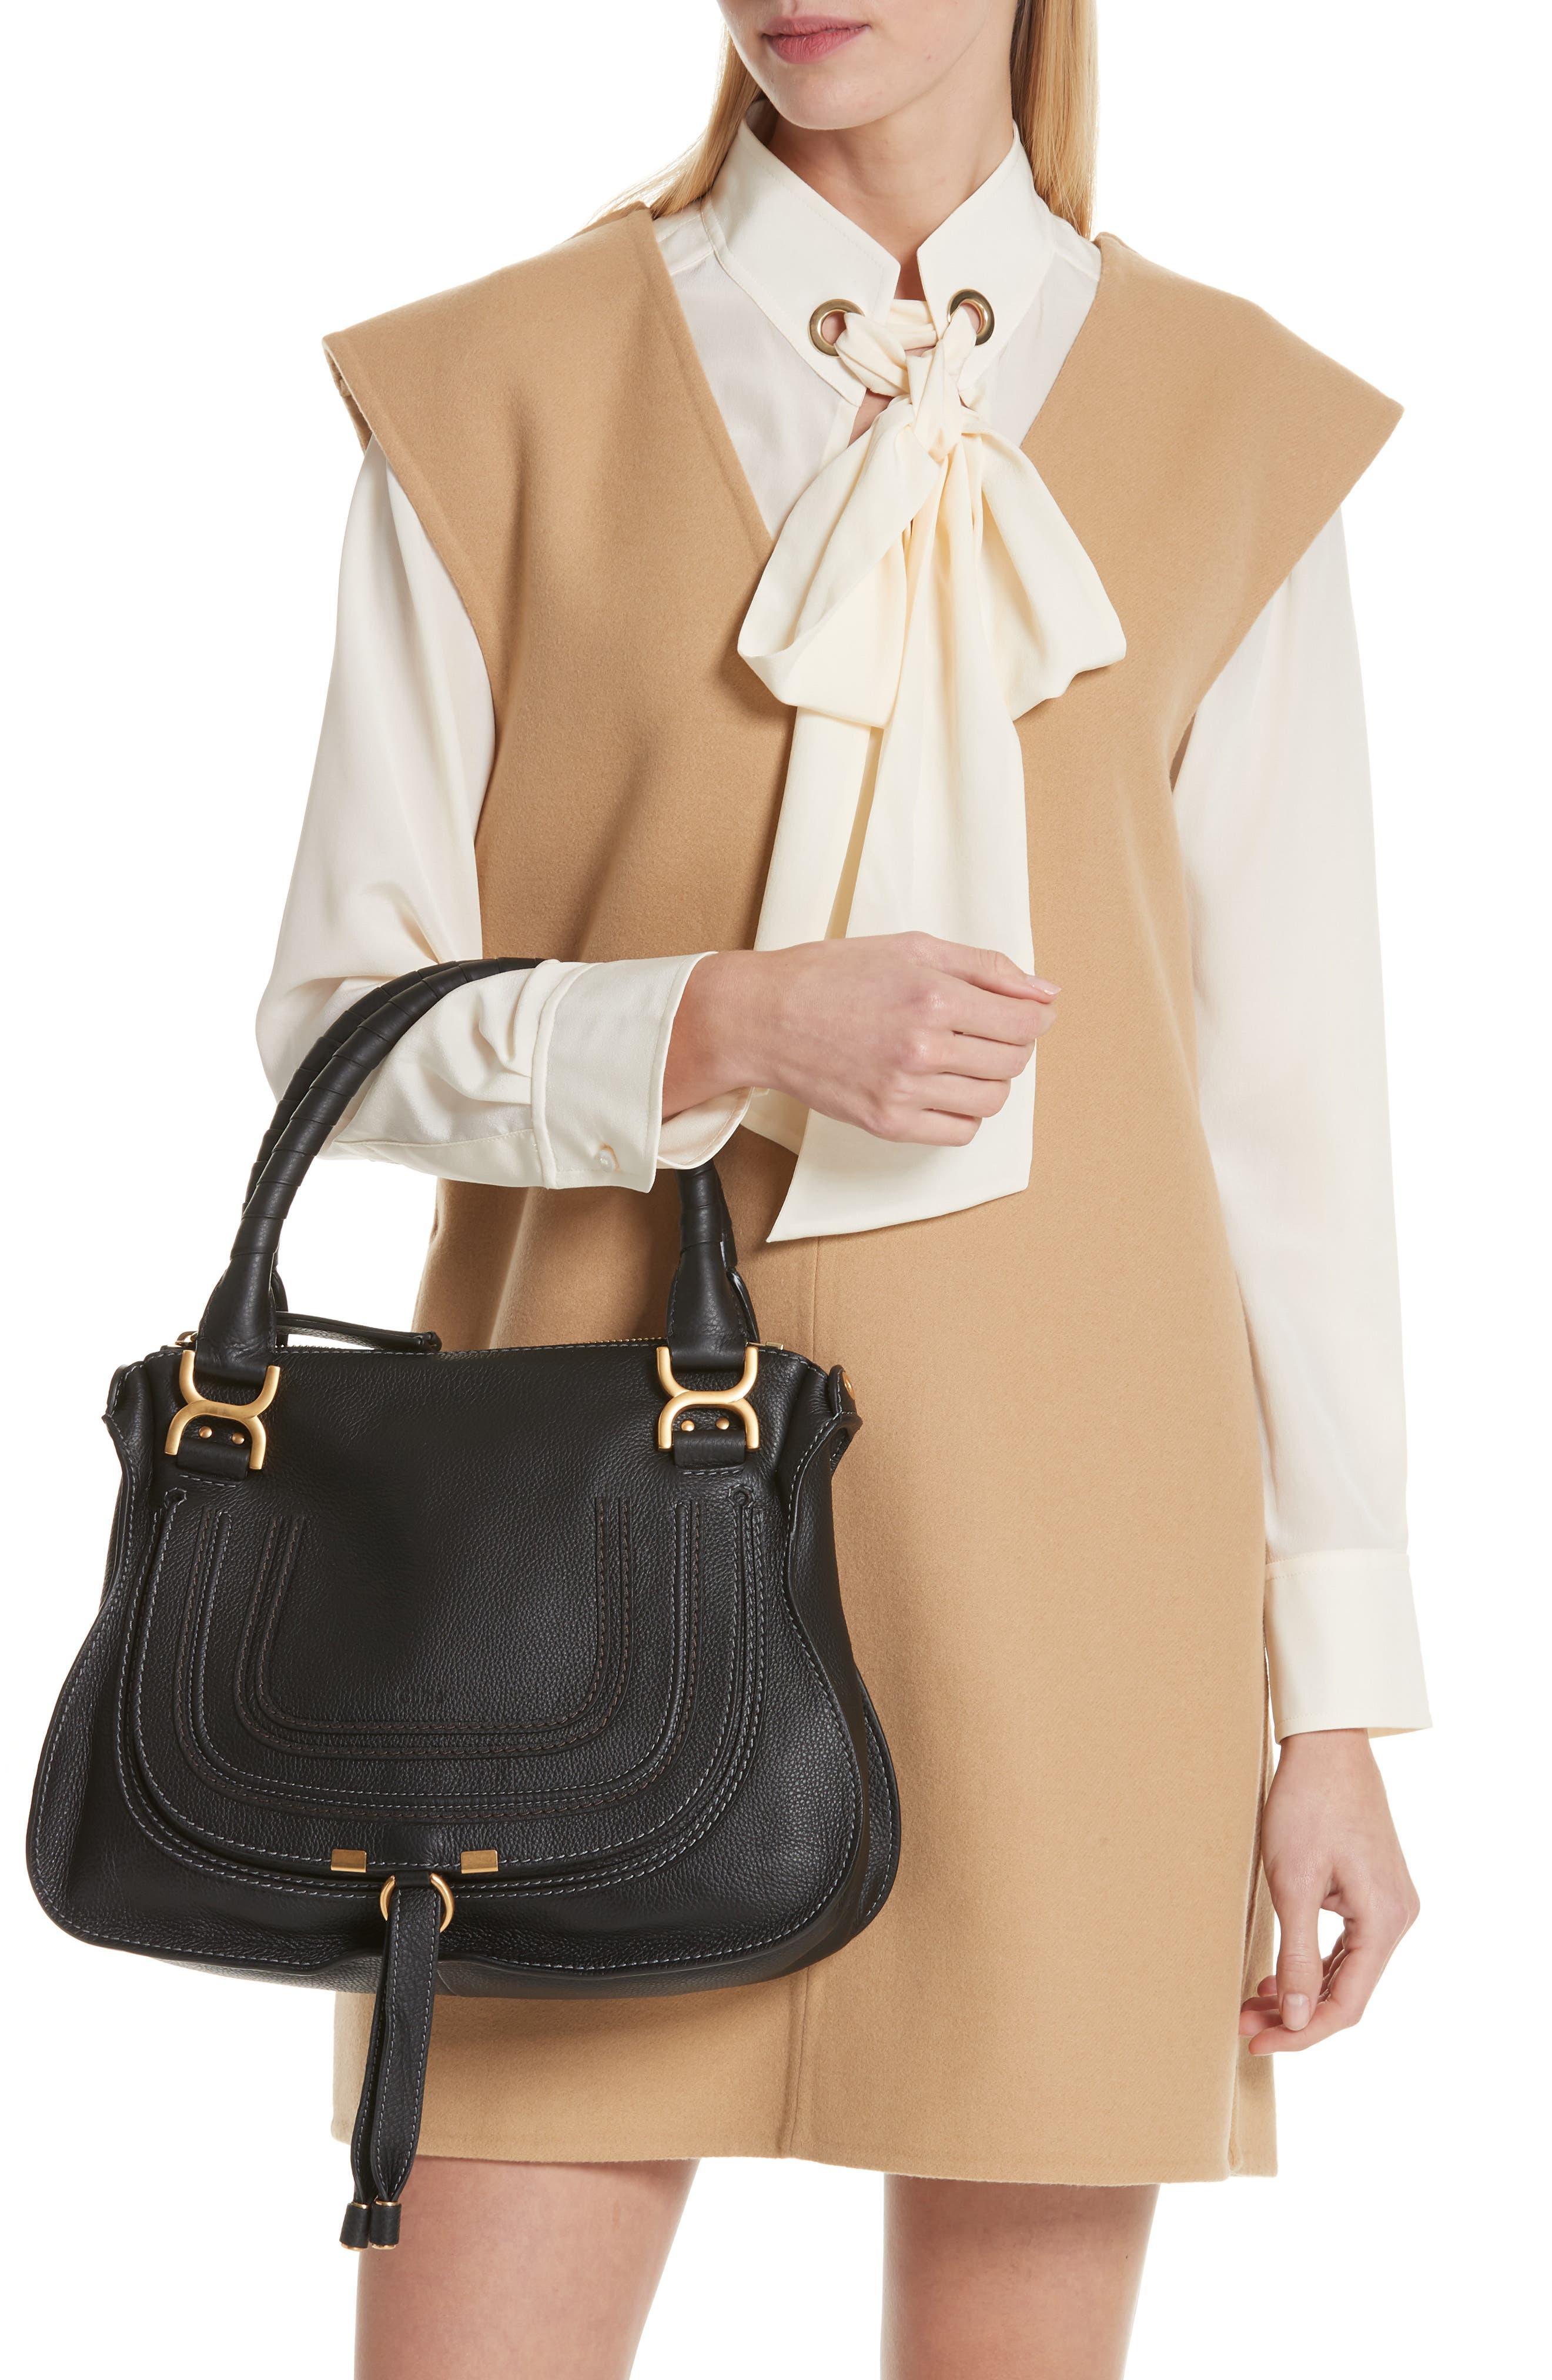 CHLOÉ, 'Medium Marcie' Leather Satchel, Alternate thumbnail 2, color, BLACK GOLD HRDWRE